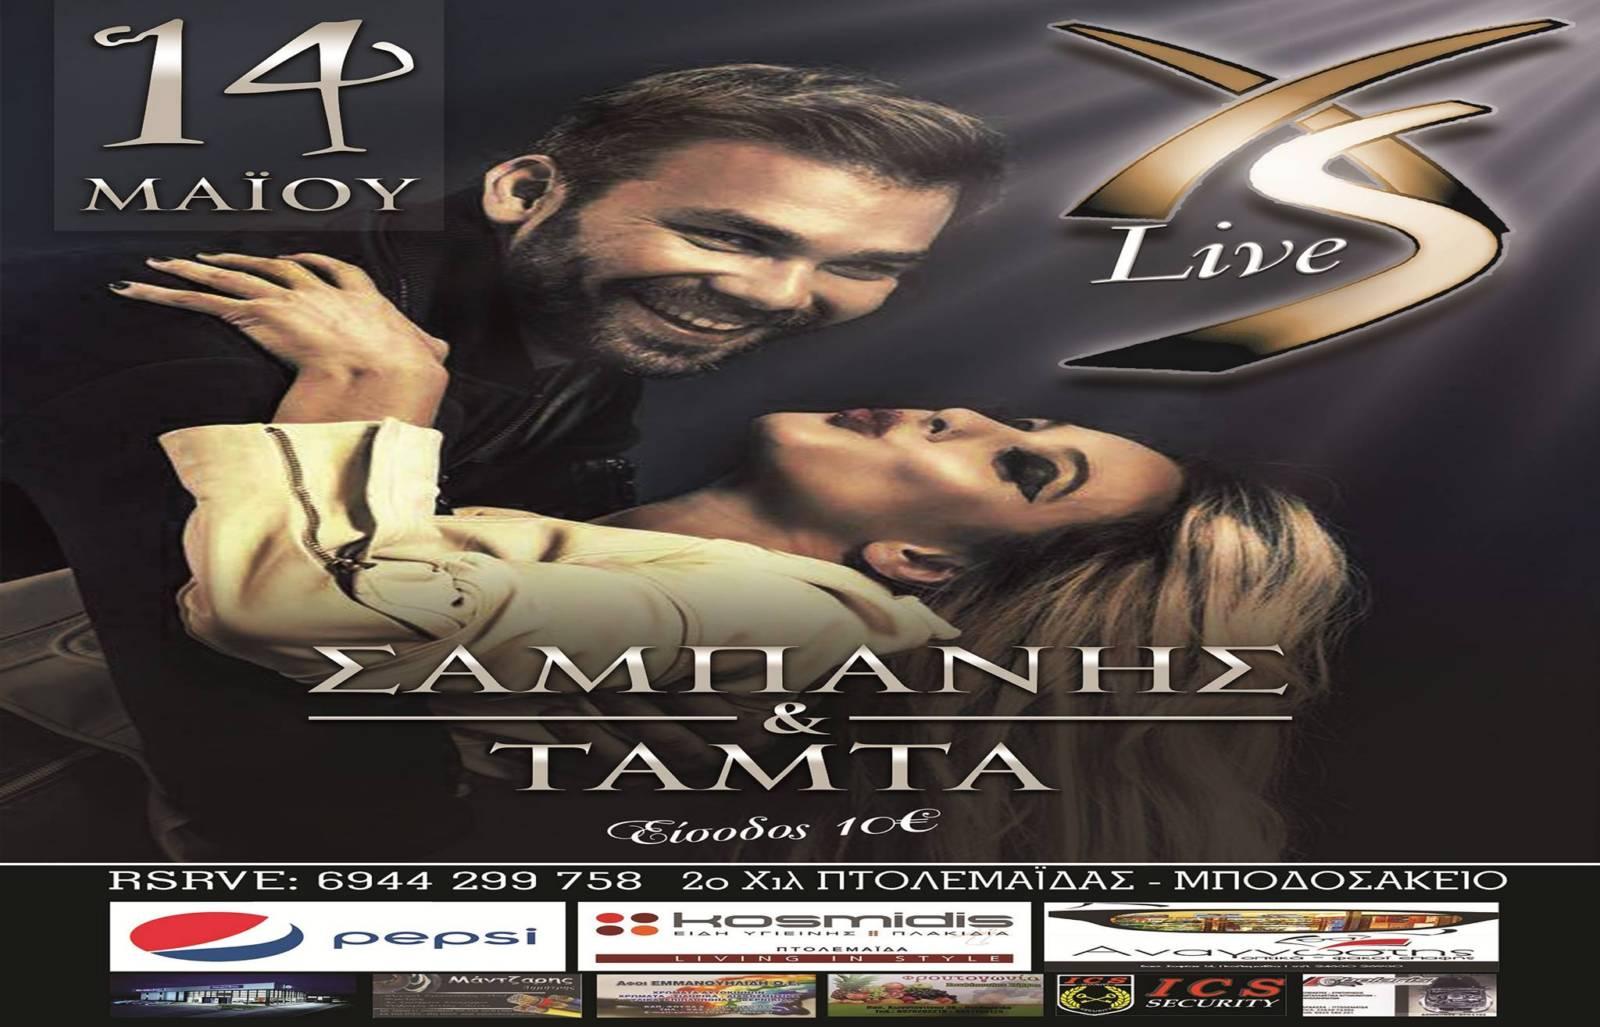 O Γιώργος Σαμπάνης και η Τάμτα  στο XS live clubbing στην Πτολεμαΐδα, το Σάββατο 14 Μαΐου